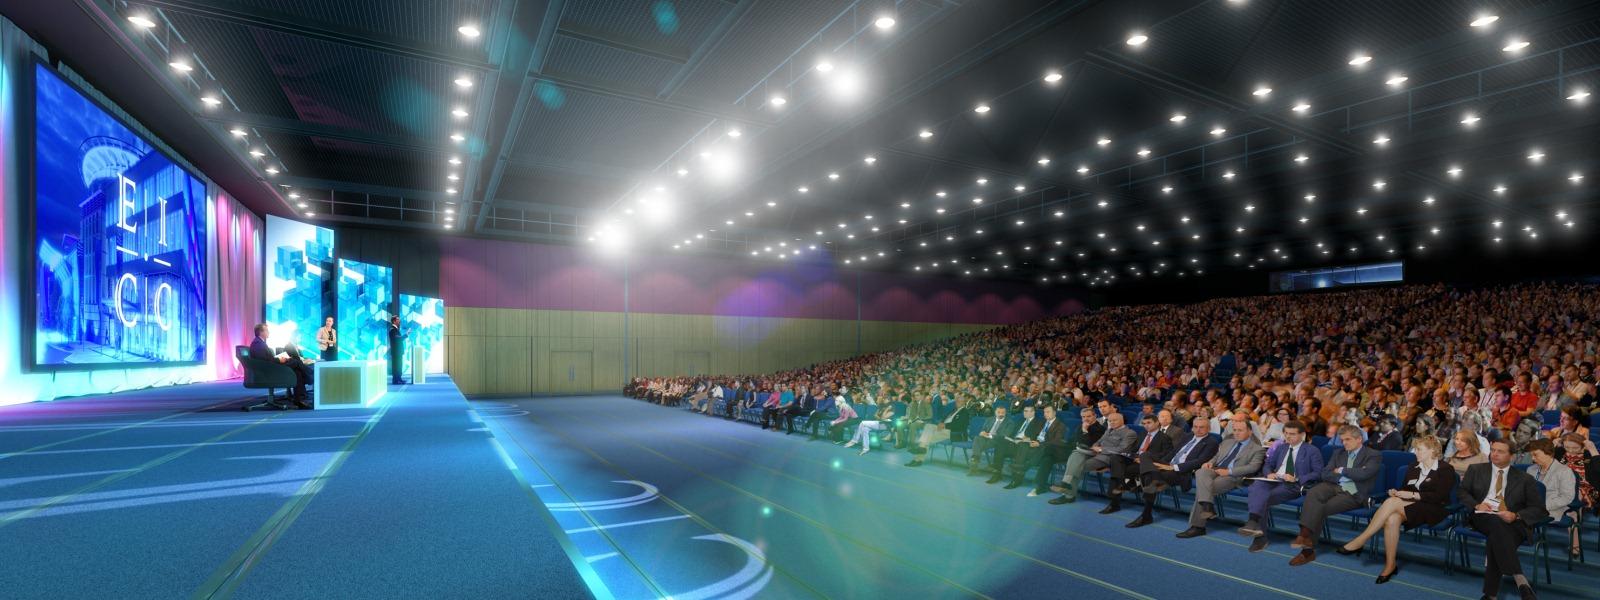 EICC-Lennox-Suite-raked-auditorium.jpg